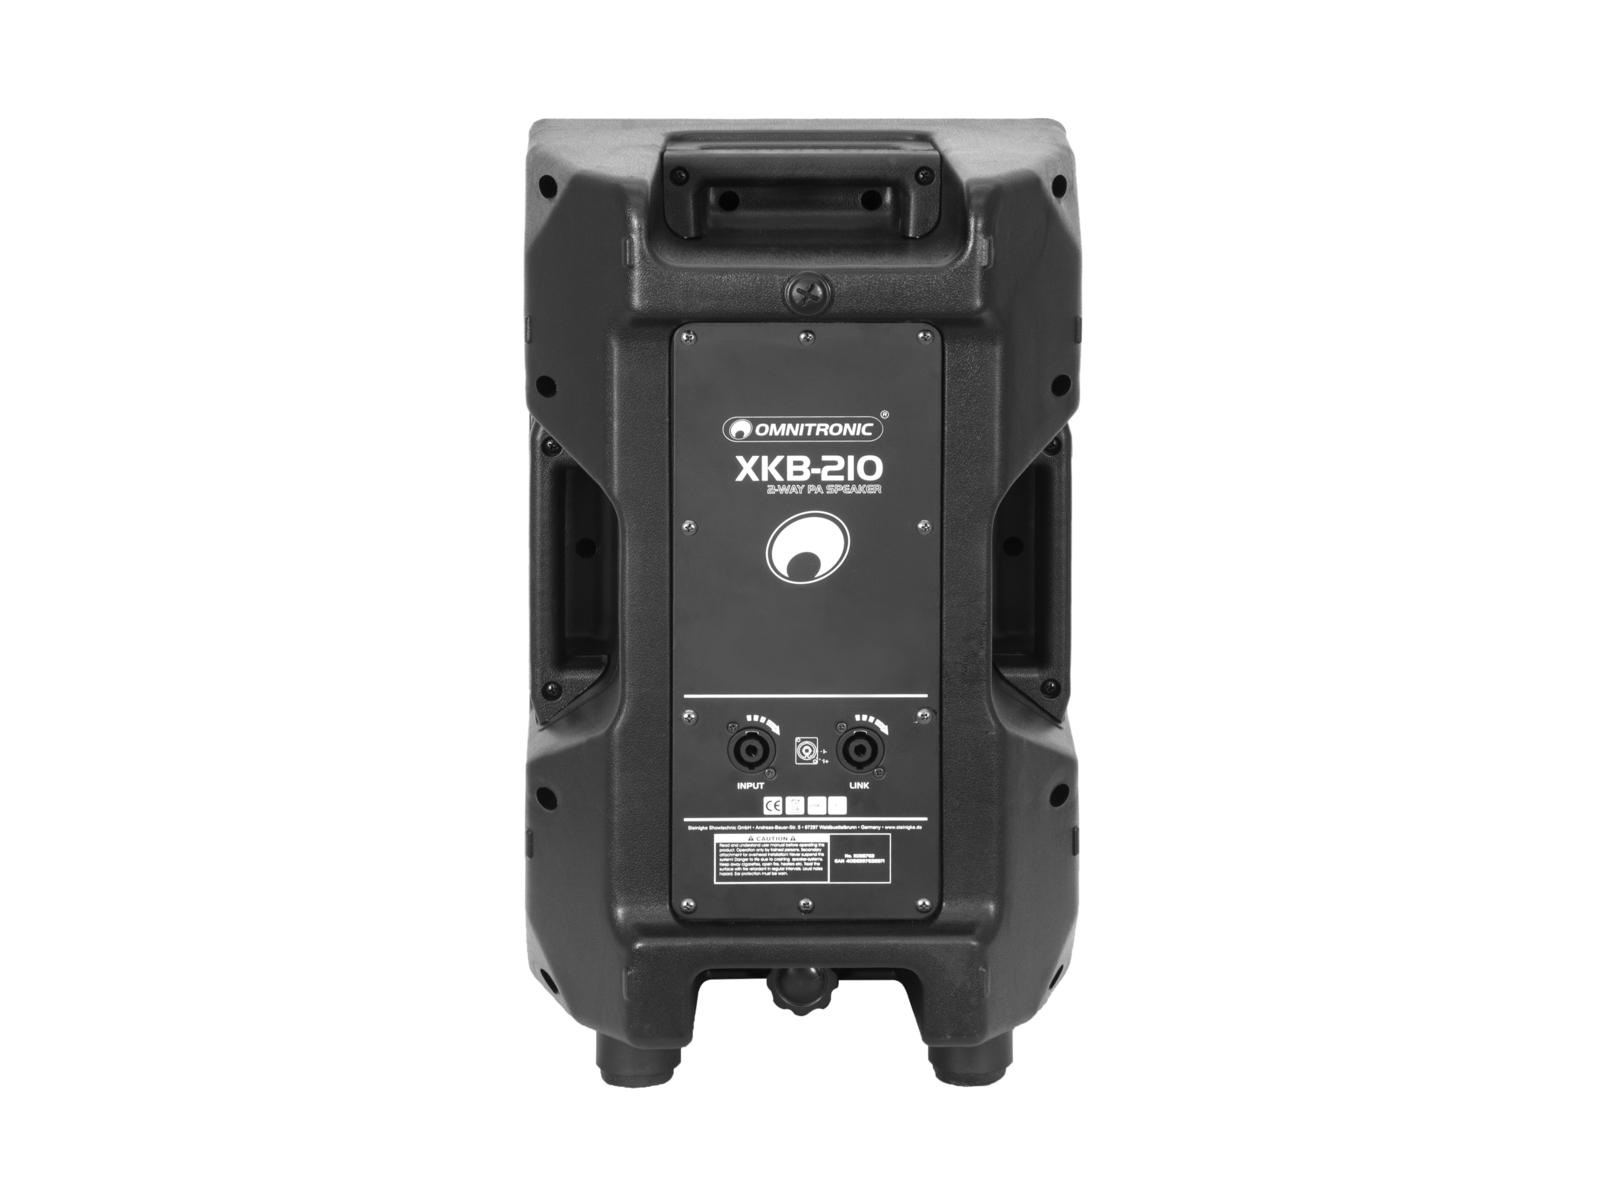 OMNITRONIC XKB-210 2-Wege Lautsprecher